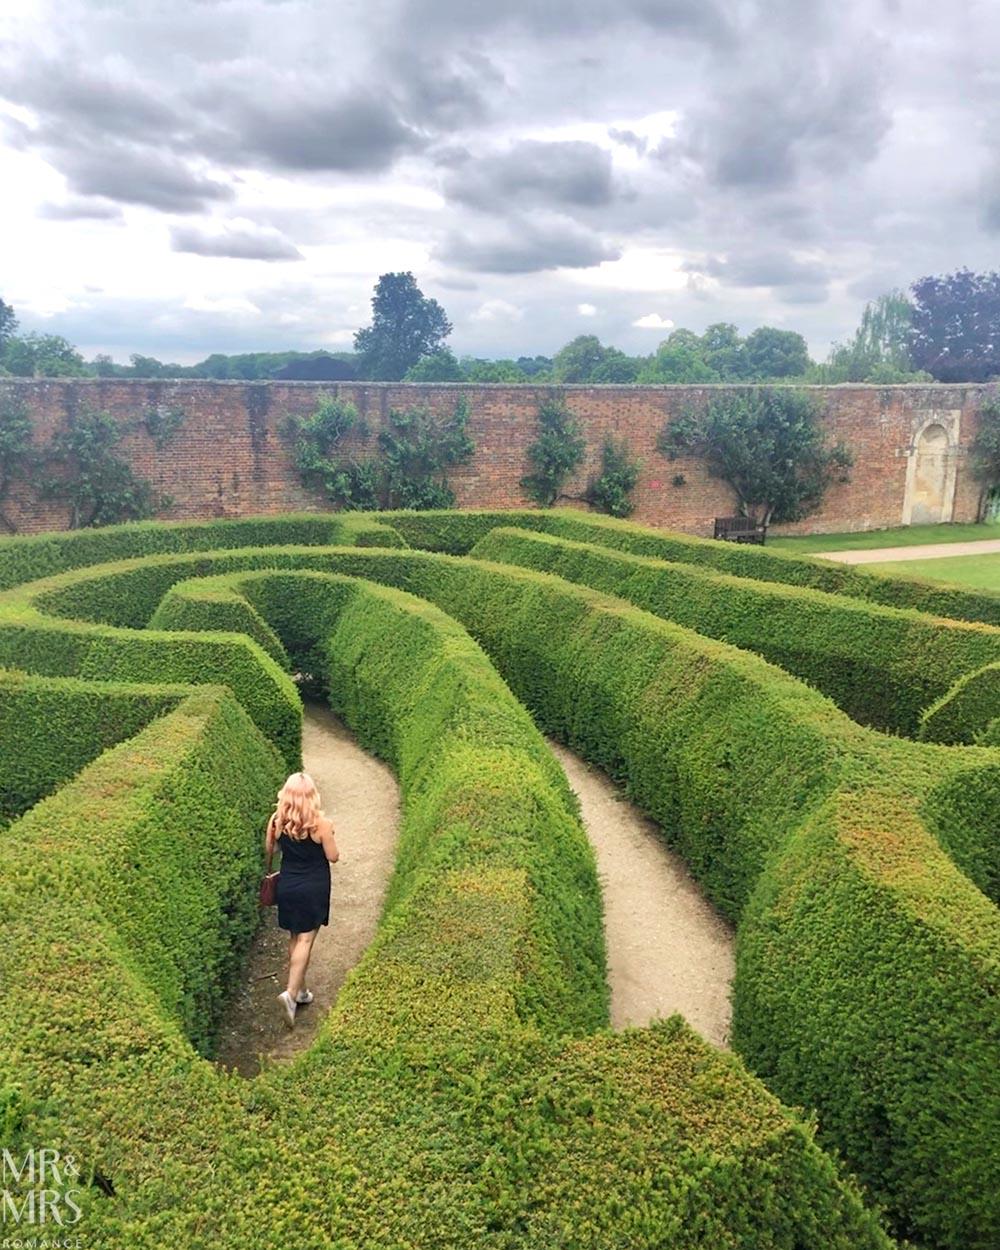 Blenheim Palace Pleasure Gardens hedge maze